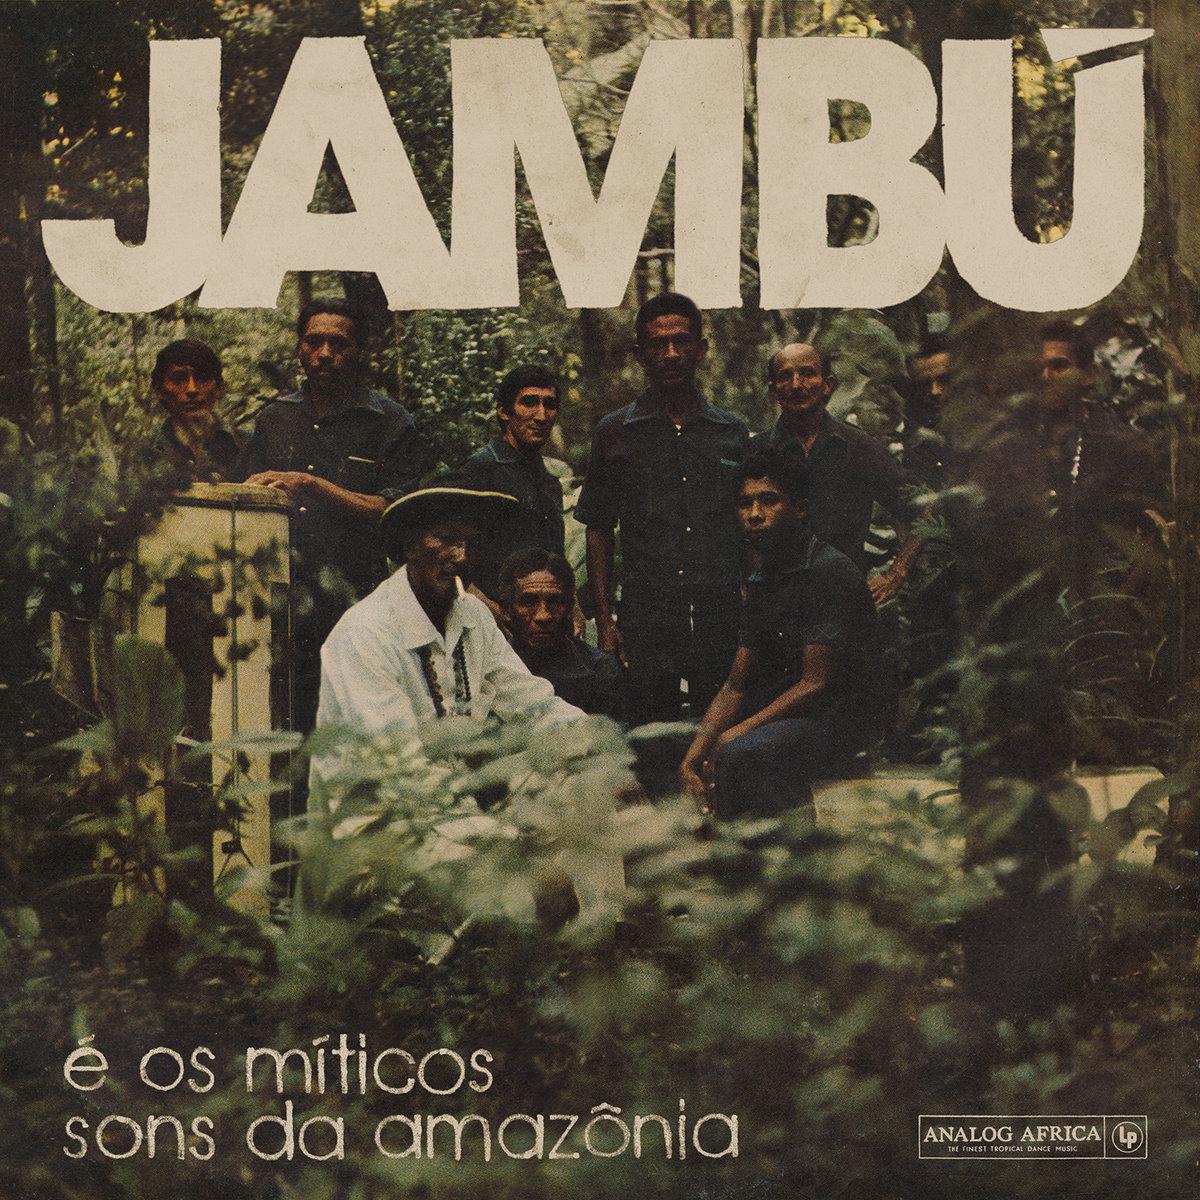 Jambú e Os Míticos Sons Da Amazônia  Release Date: June 21, 2019 Label: Analog Africa  SERVICE: Mastering, Restoration NUMBER OF DISCS: 1, 2 GENRE: Brazilian FORMAT: CD, LP